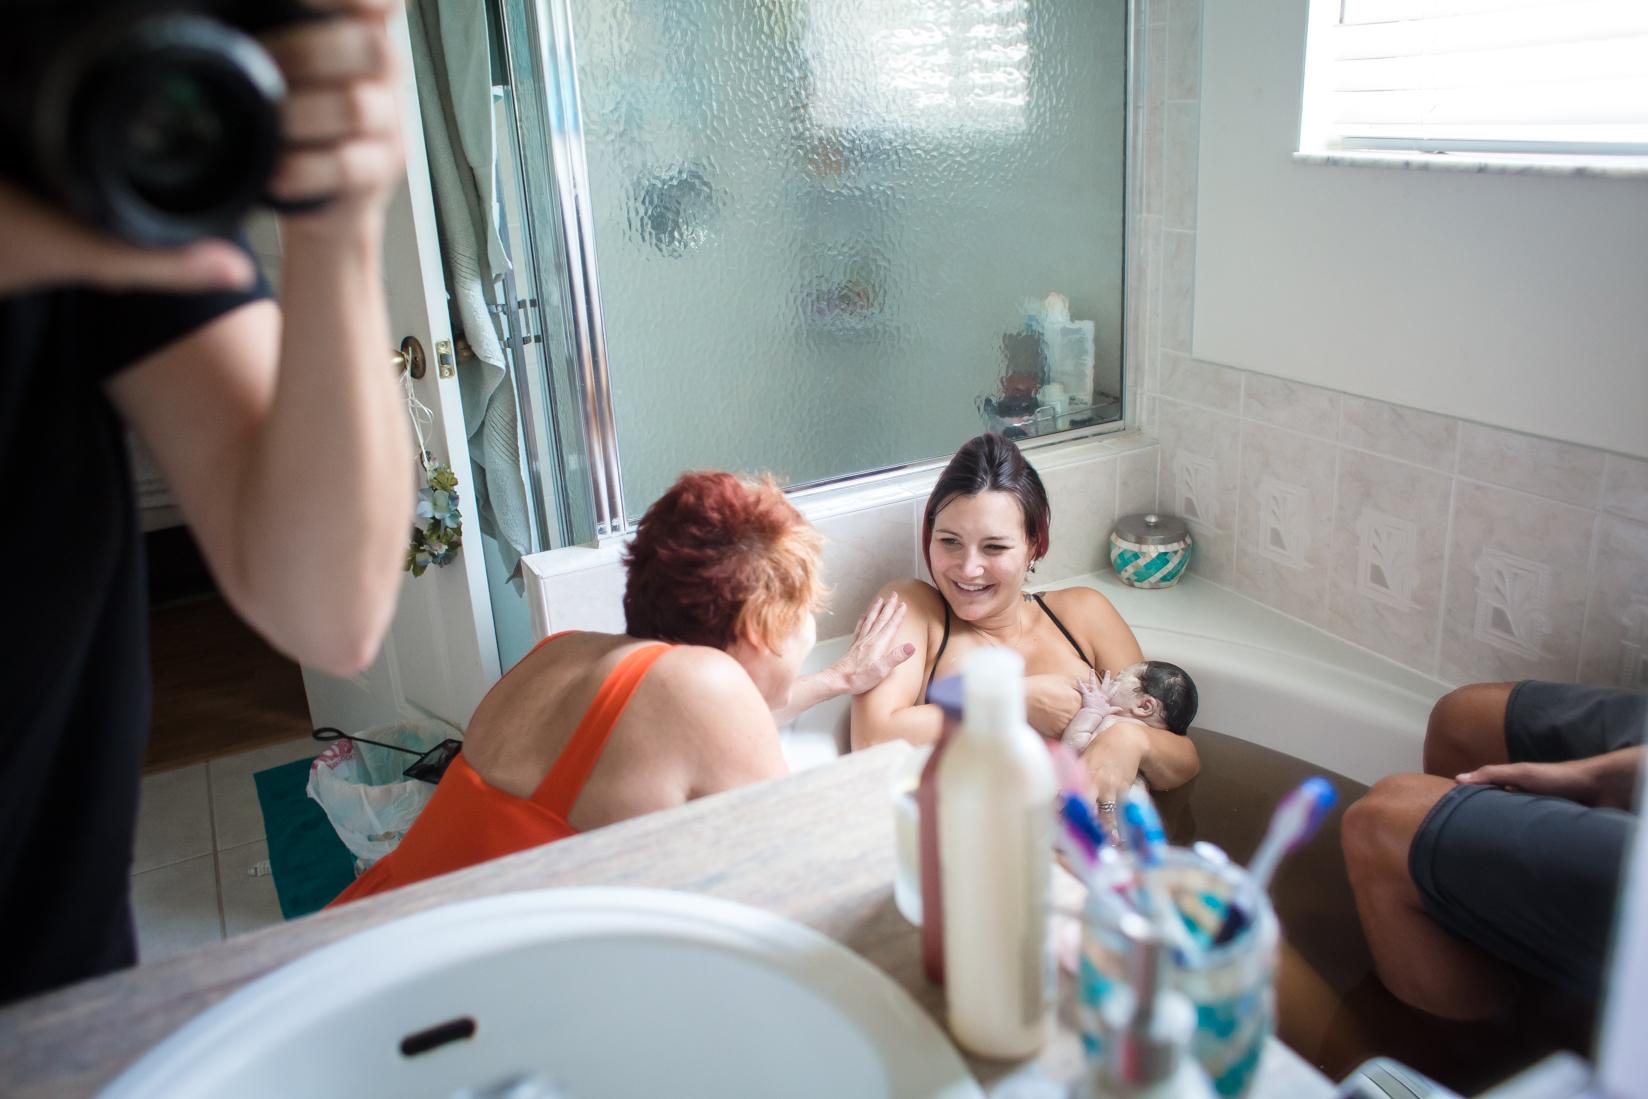 gelena-hinkley-natural-birthworks-doula-childbirth-class-birth-center-lactation-home-breastfeeding-cloth-diaper-15.jpg